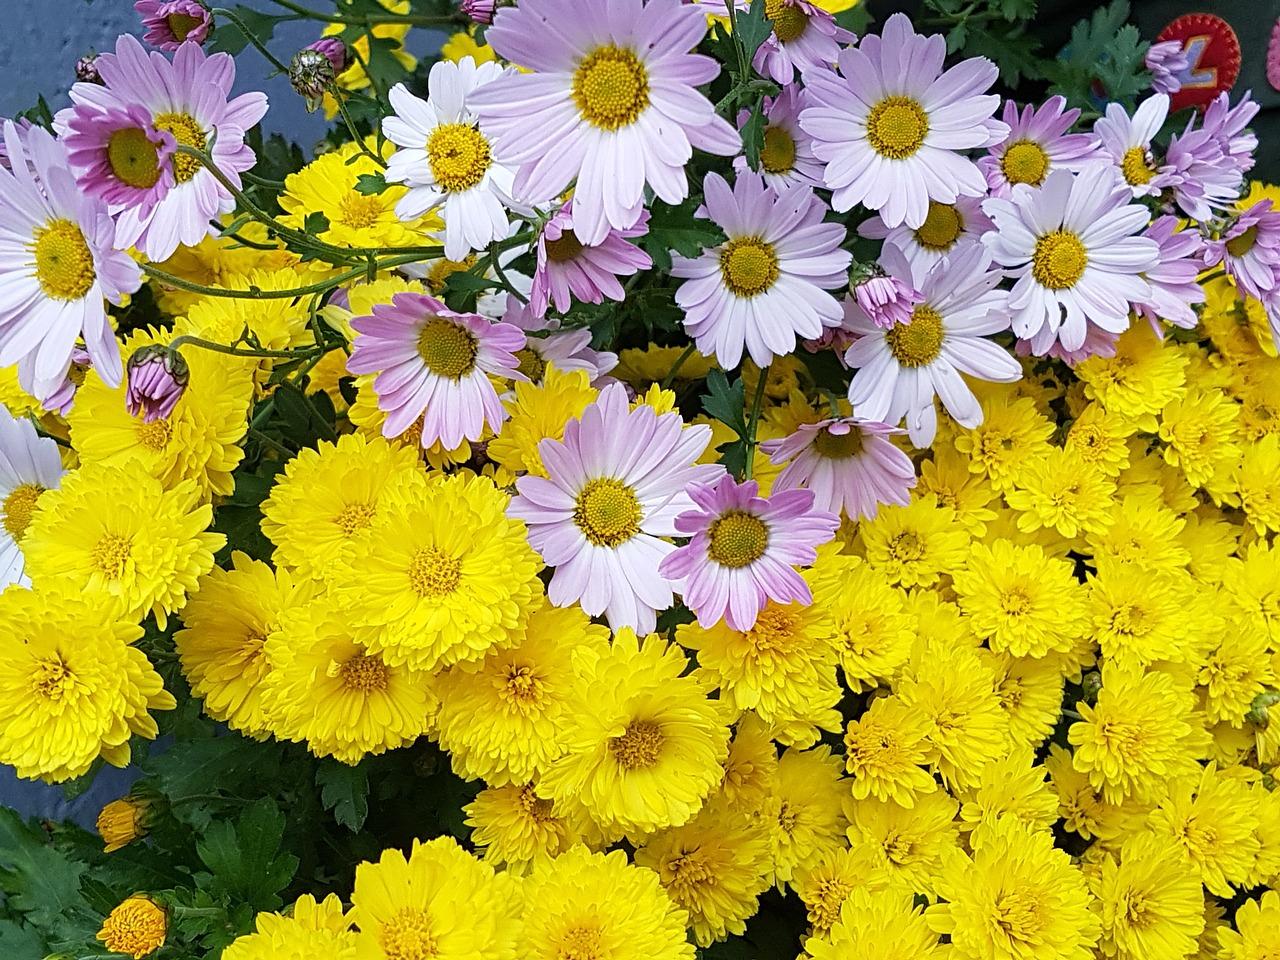 Kogikuyellowfall flowersflowerschrysanthemum free photo from kogiku yellow fall flowers mightylinksfo